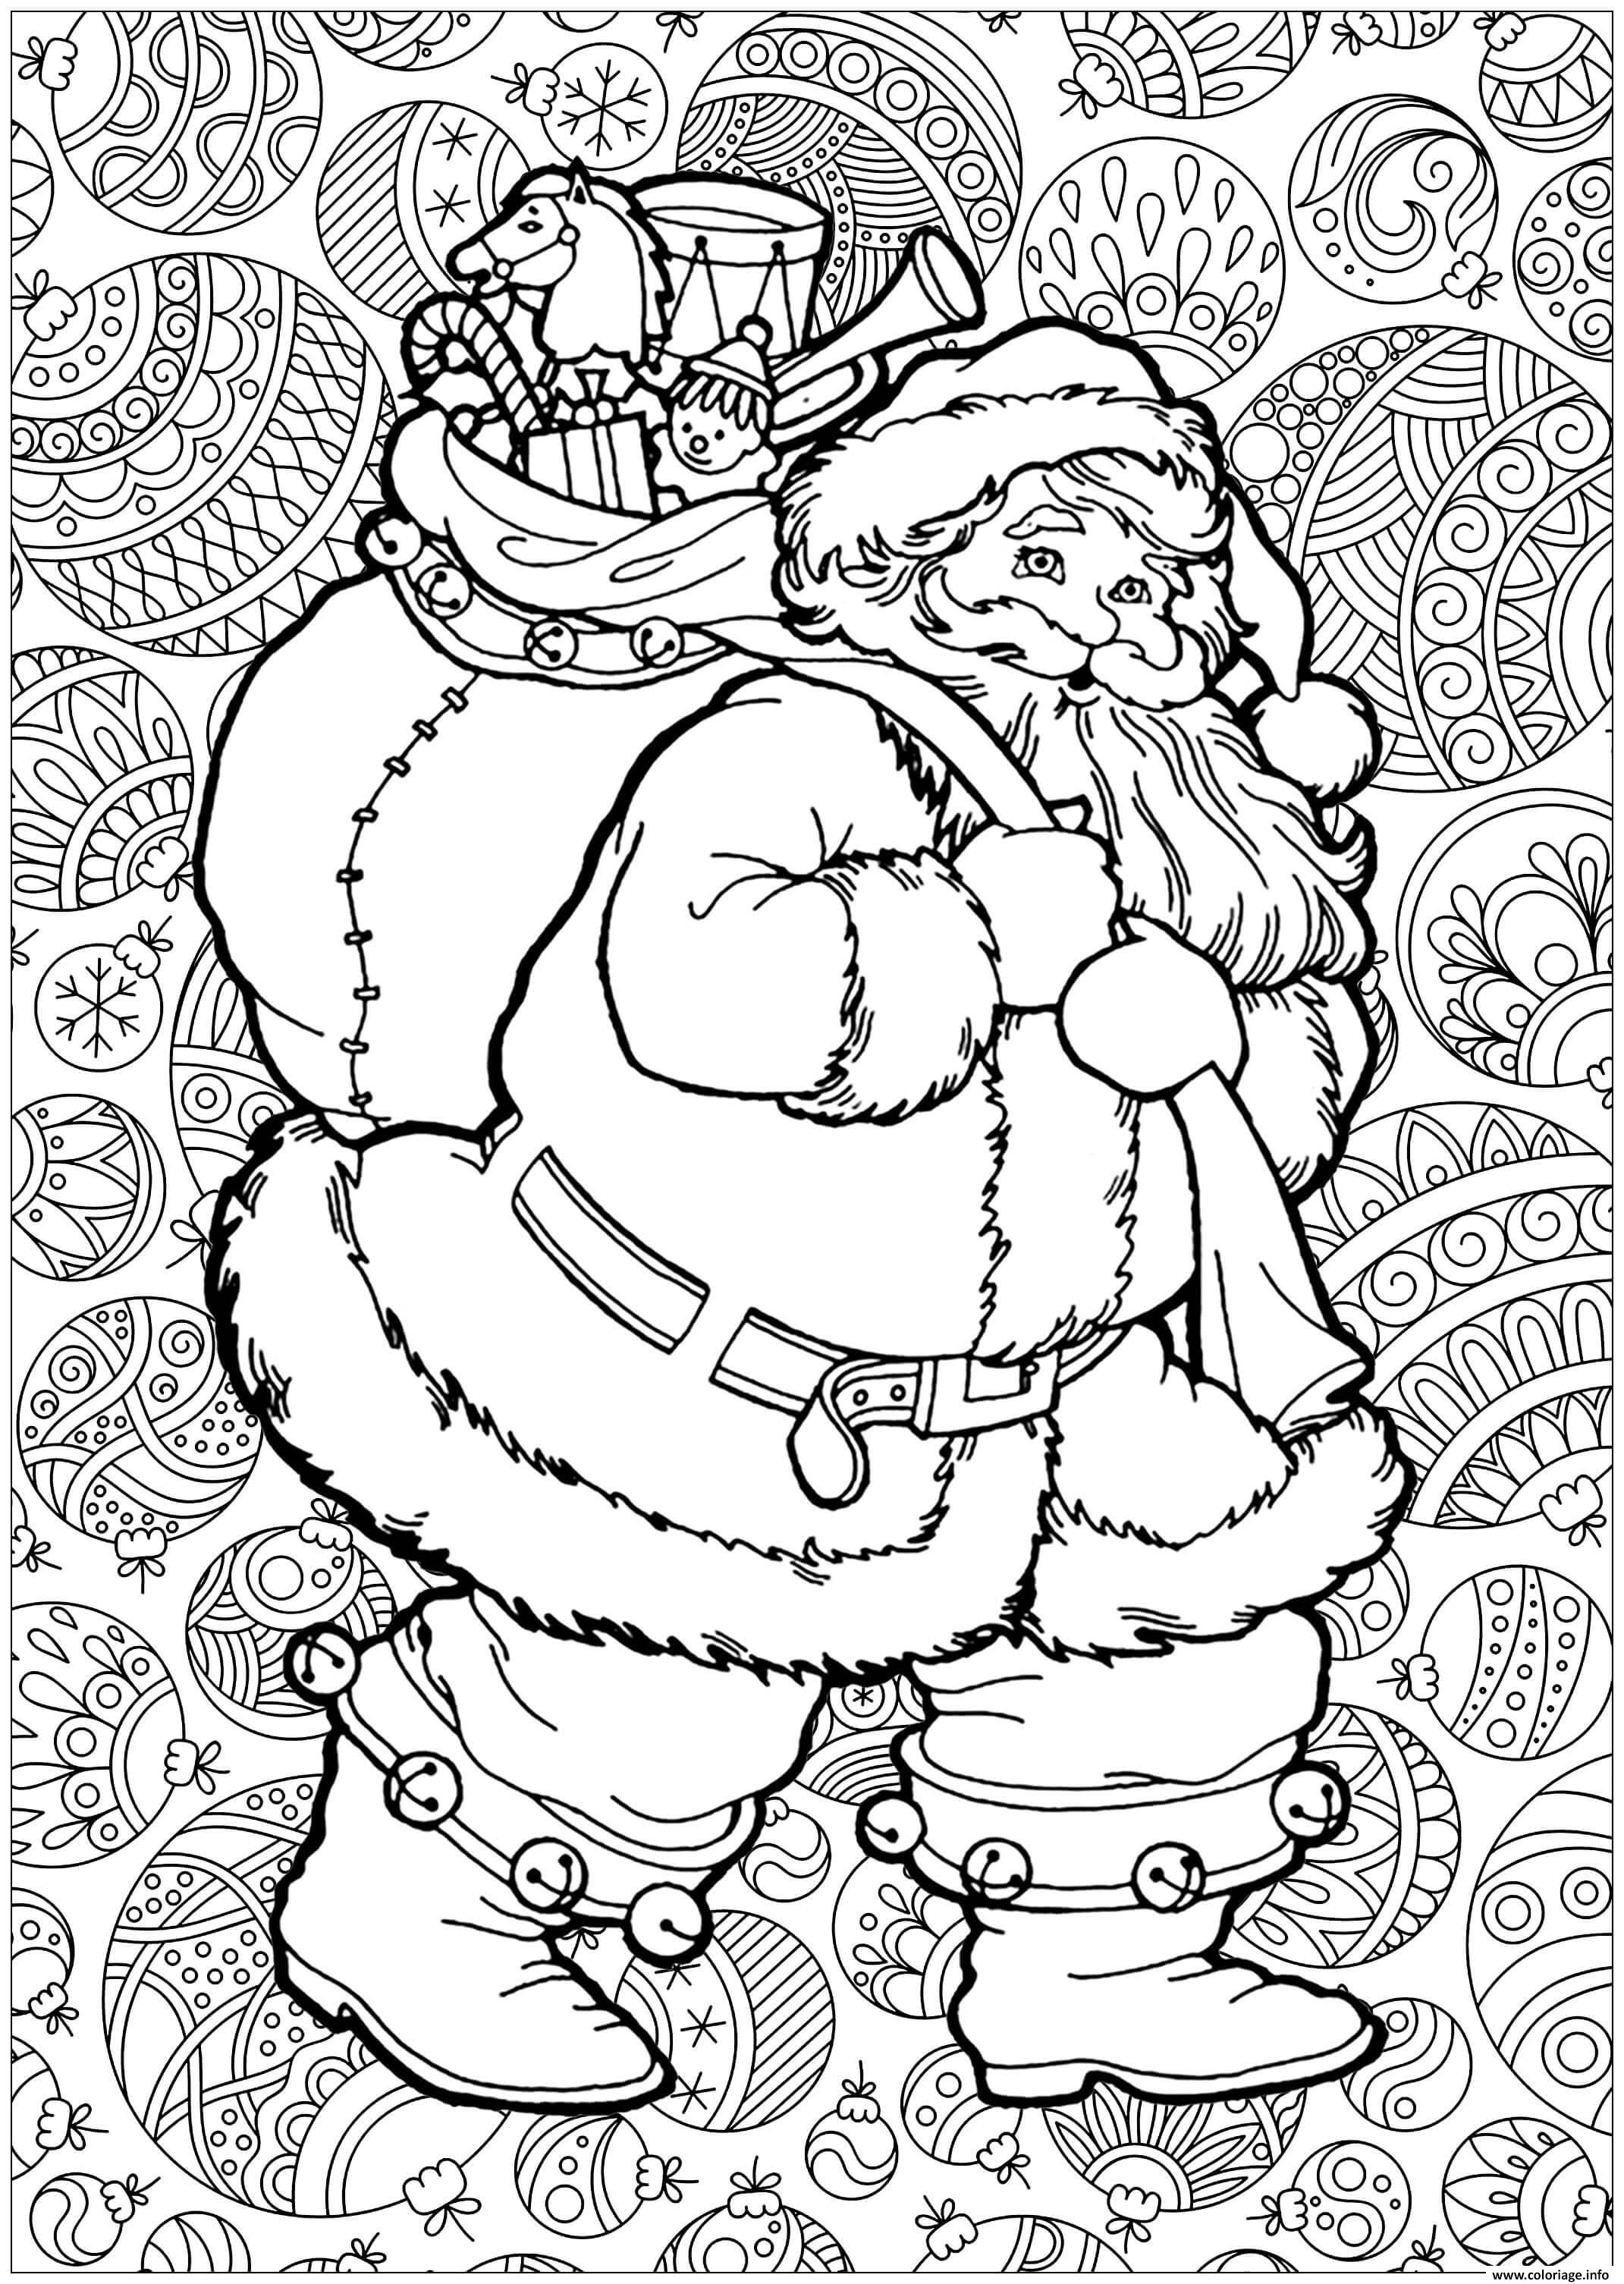 Coloriage Adulte Pere Noel Avec Fond De Boules De Noel dessin